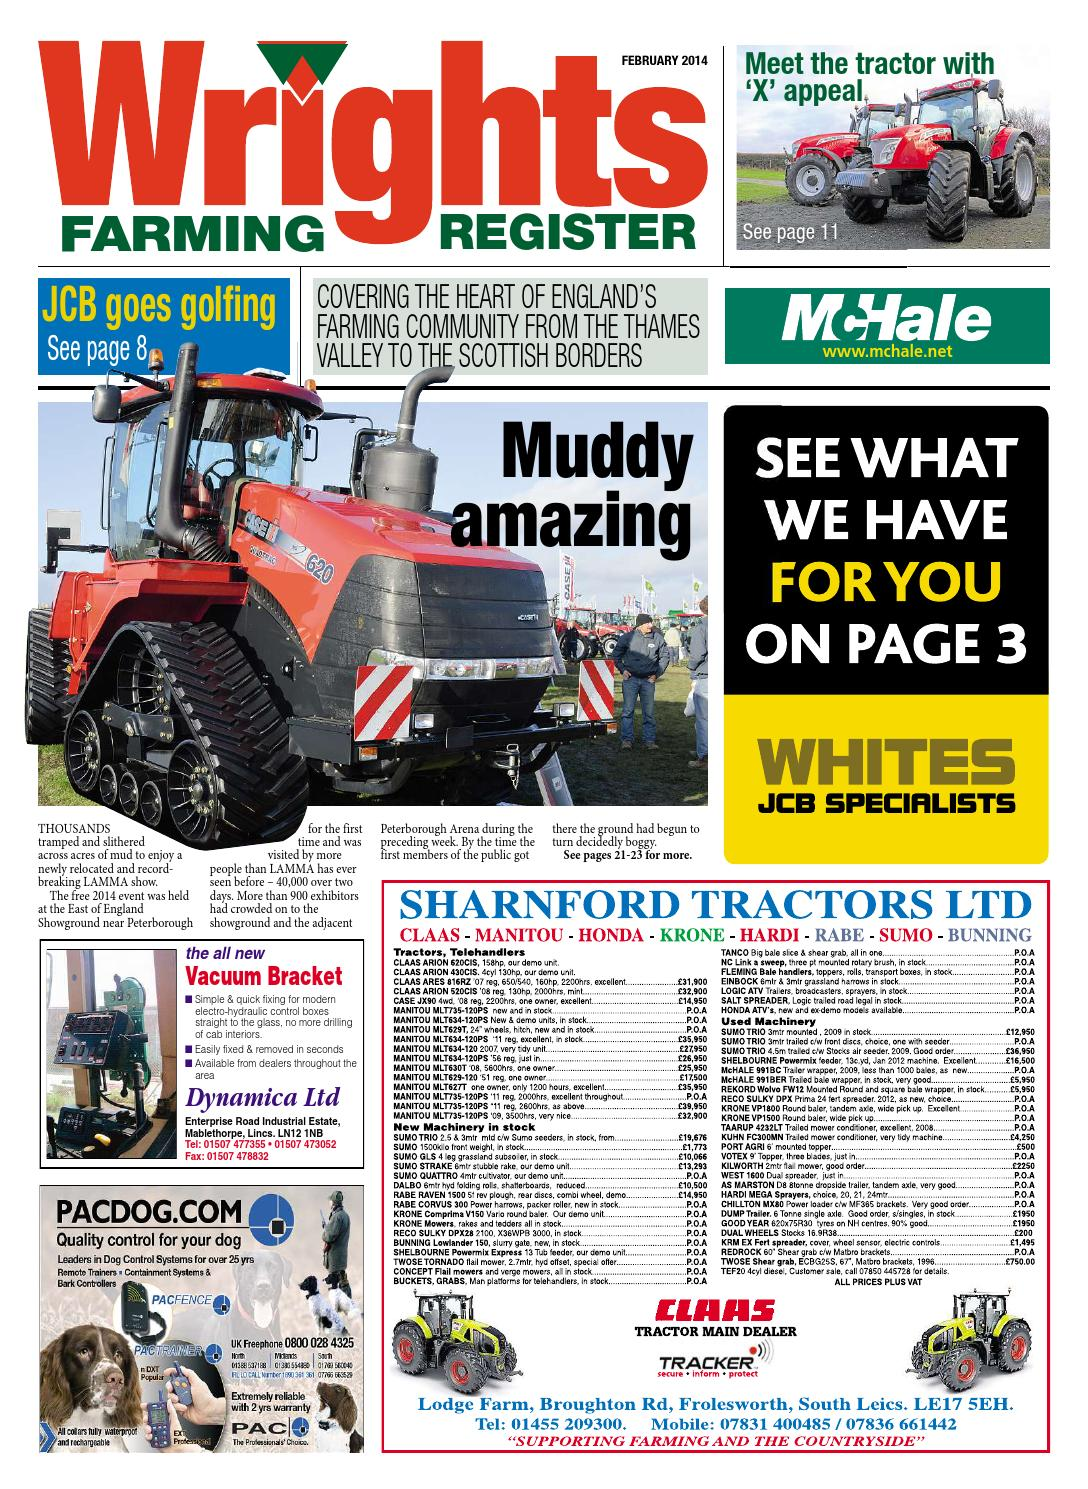 Wrights Farming Register - February 2014 - Full Edition by Mortons Media  Group Ltd - issuu